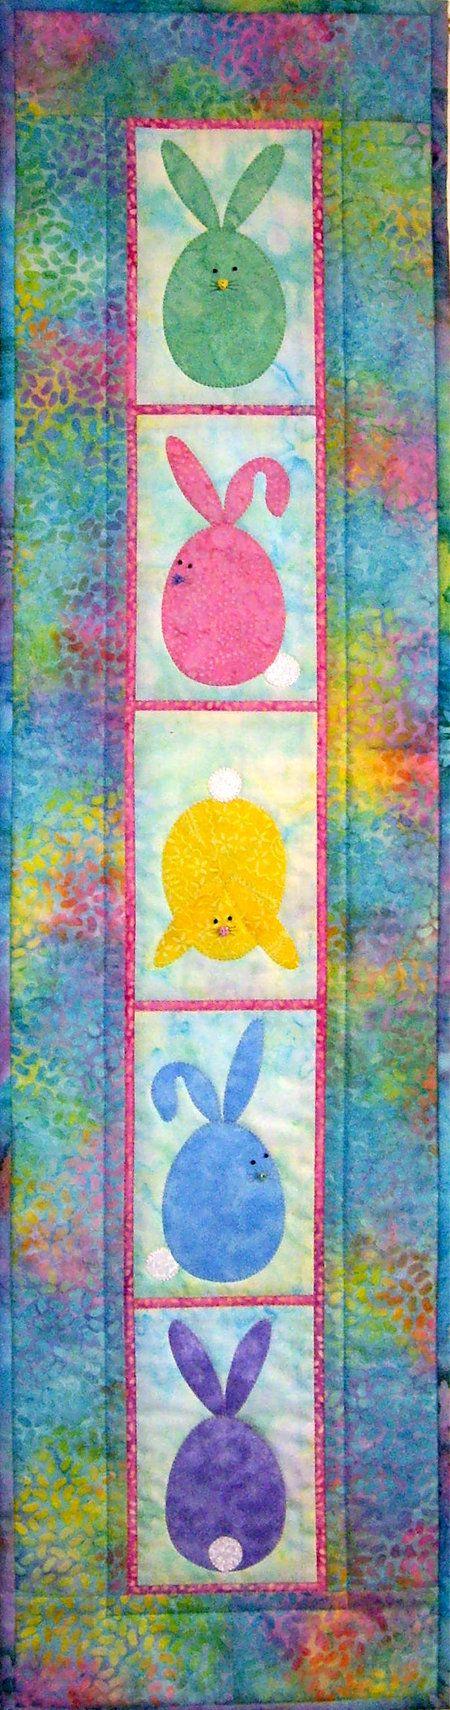 cute bunny wall hanging